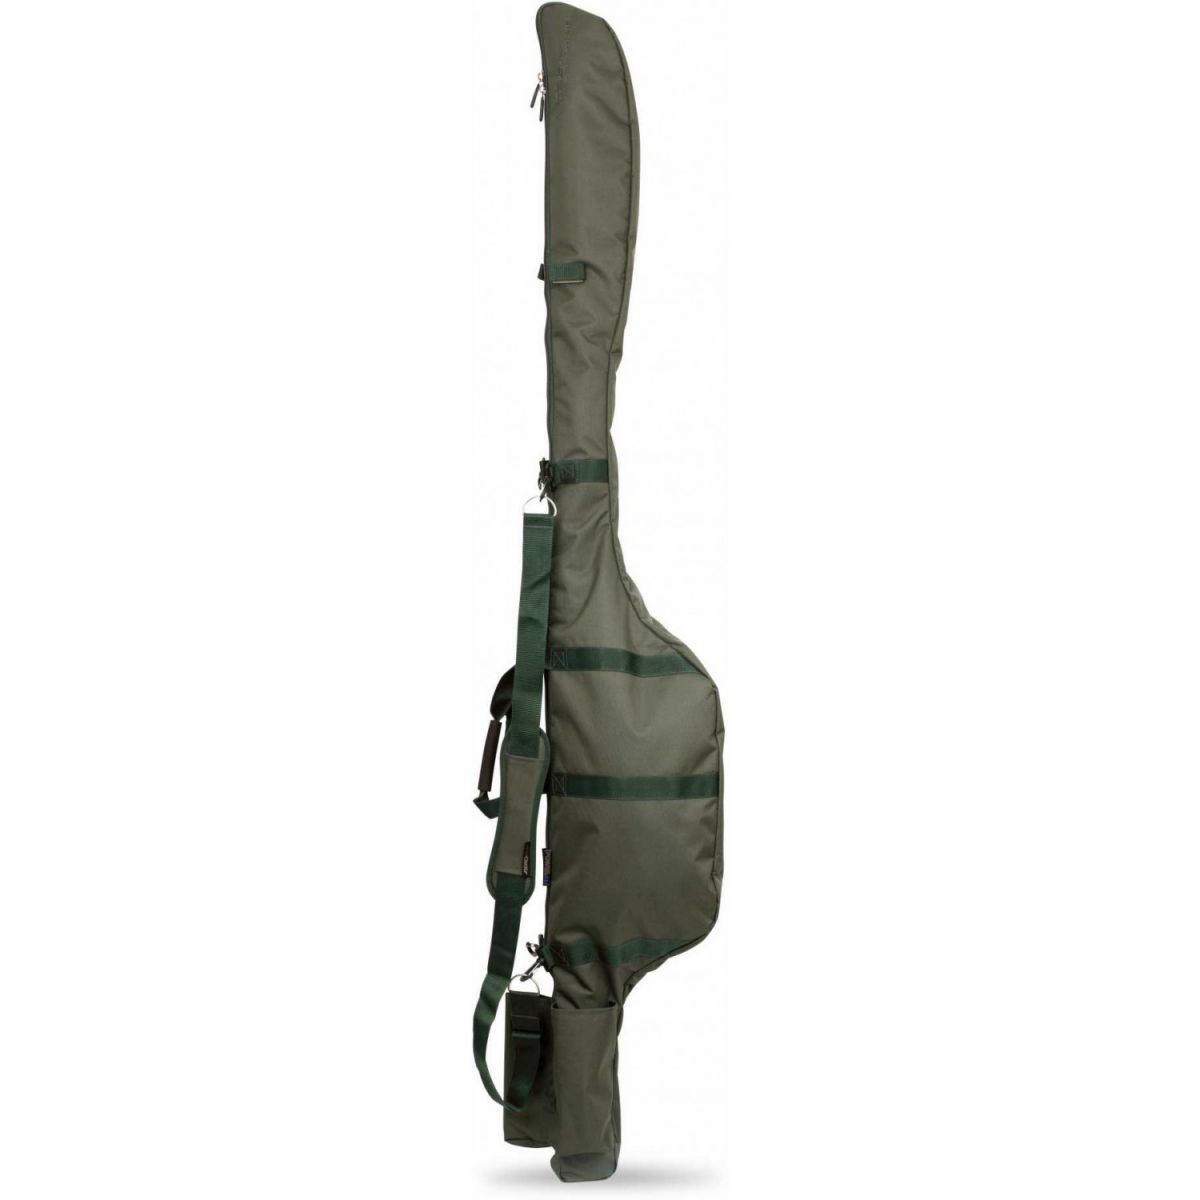 /produkty/112/obaly-na-pruty/Shimano/Puzdro-na-udice-Tribal-32-Compact-Rod-Sleeve